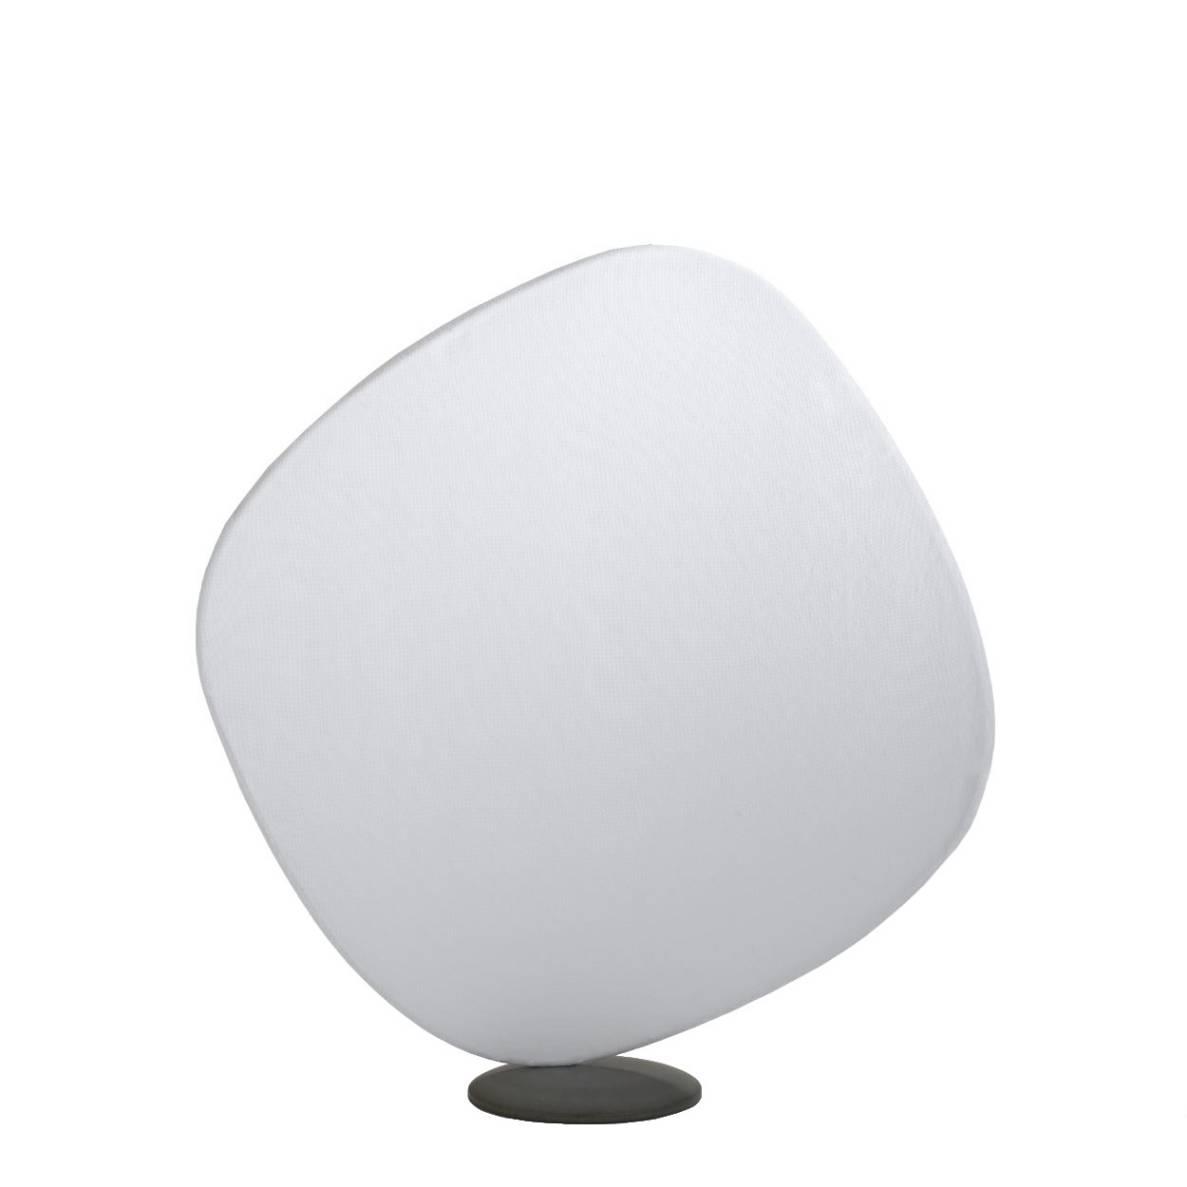 Offecct Wind-D Akustik Raumteiler in Weiß